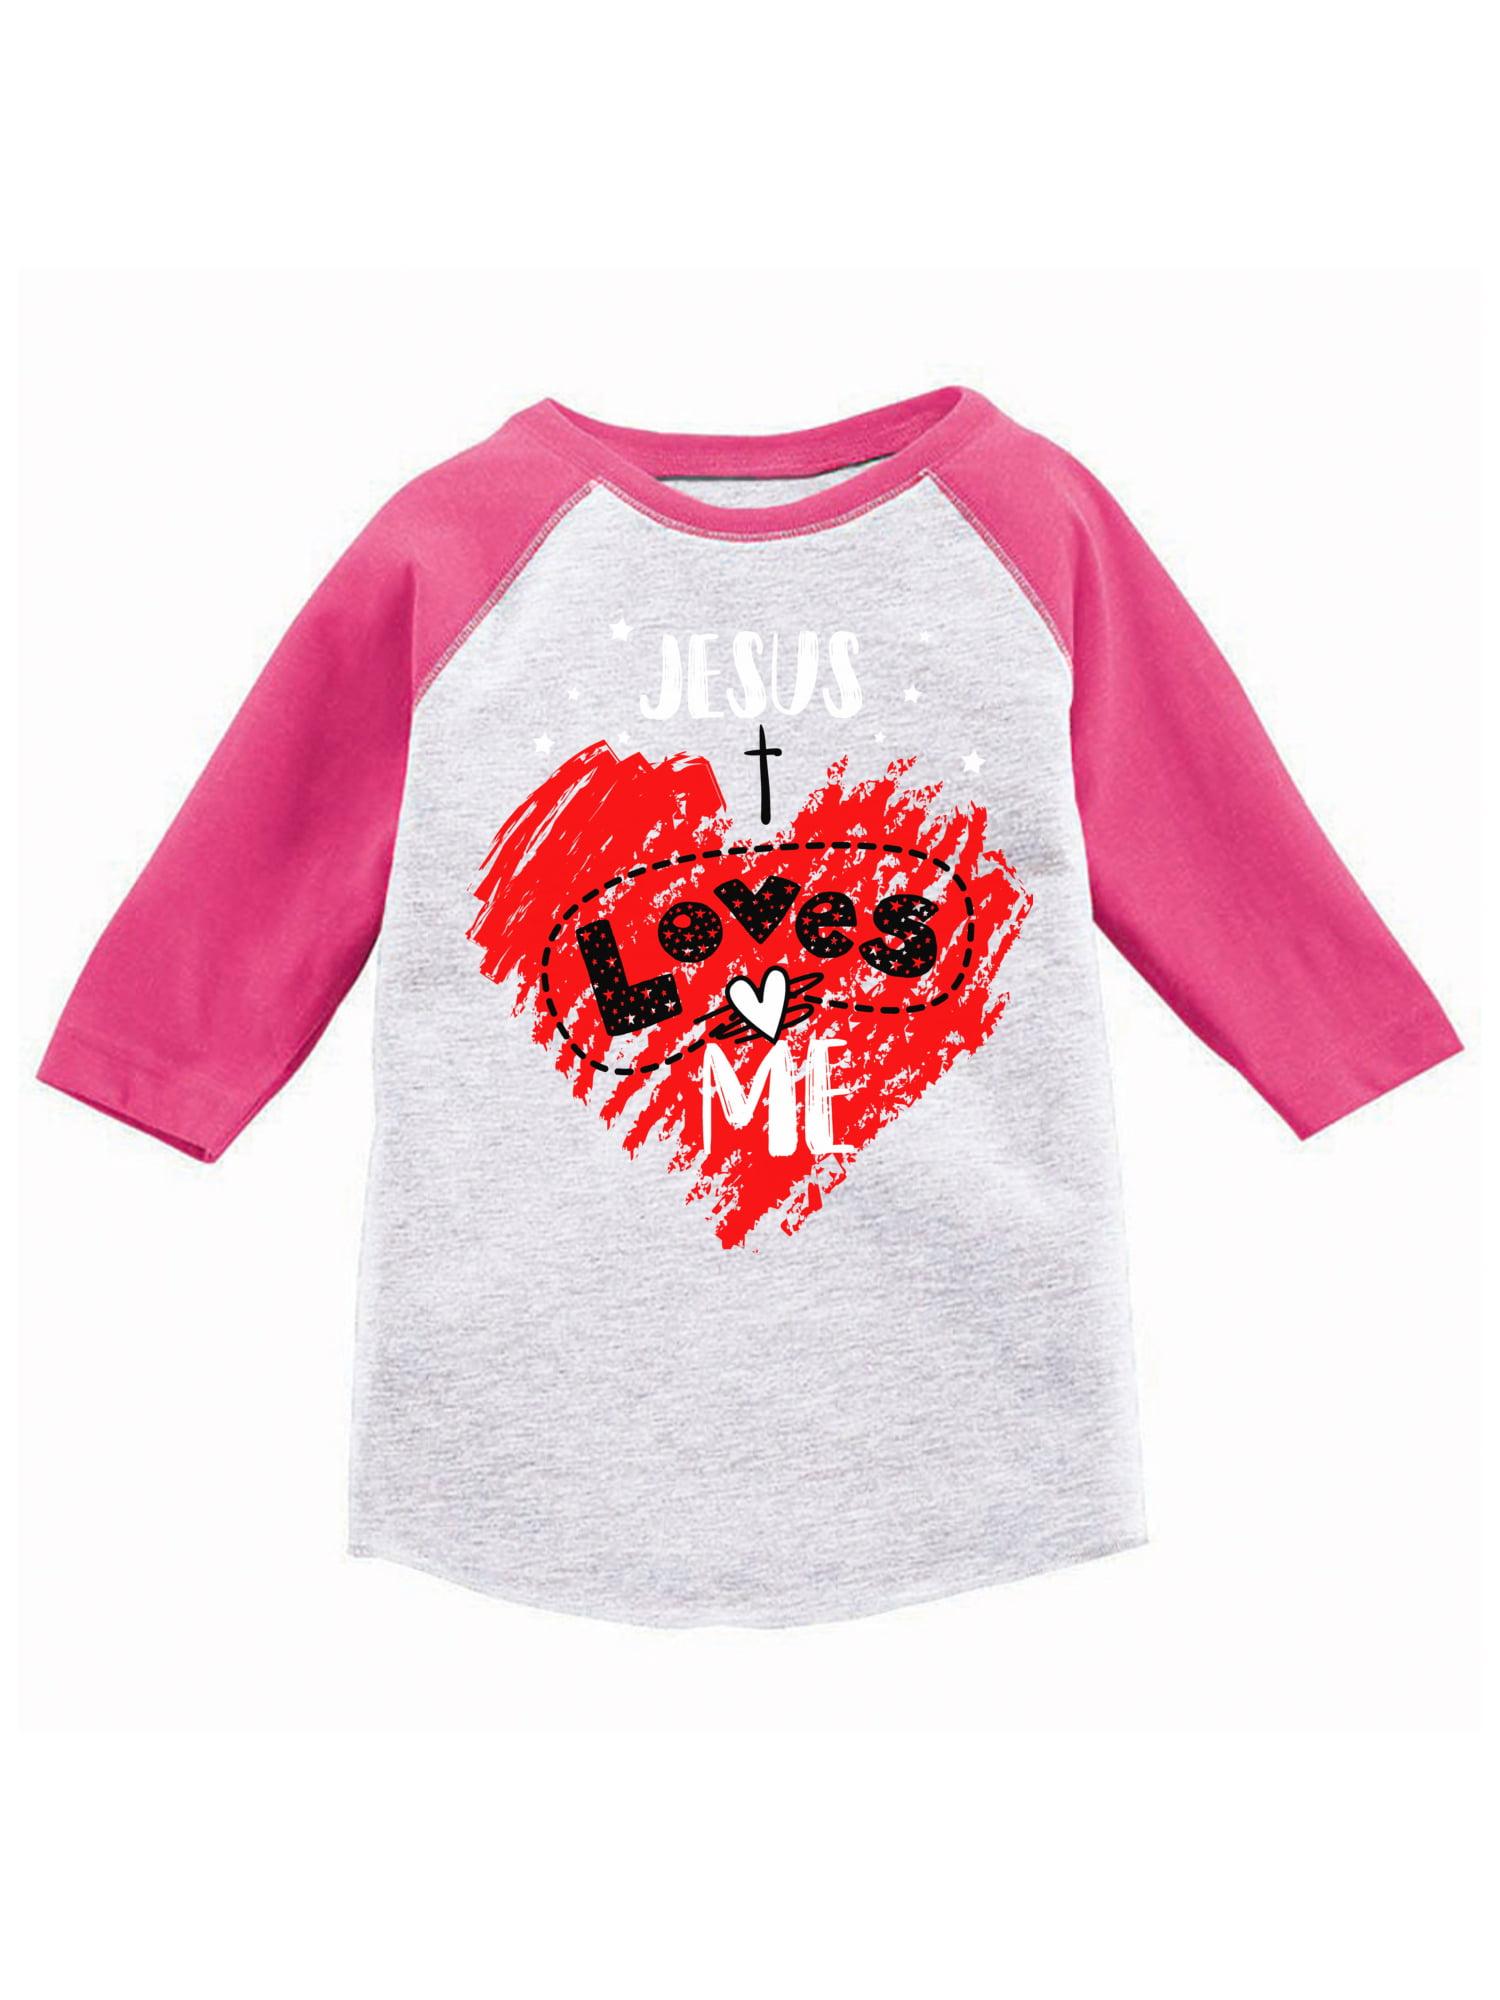 1e2e95760 Awkward Styles Jesus Loves Me Youth Raglan Kids Religious Jersey Tshirts  Cute Jesus Baseball Shirts for Boys Cute Jesus Baseball Shirts for Girls  God Lover ...